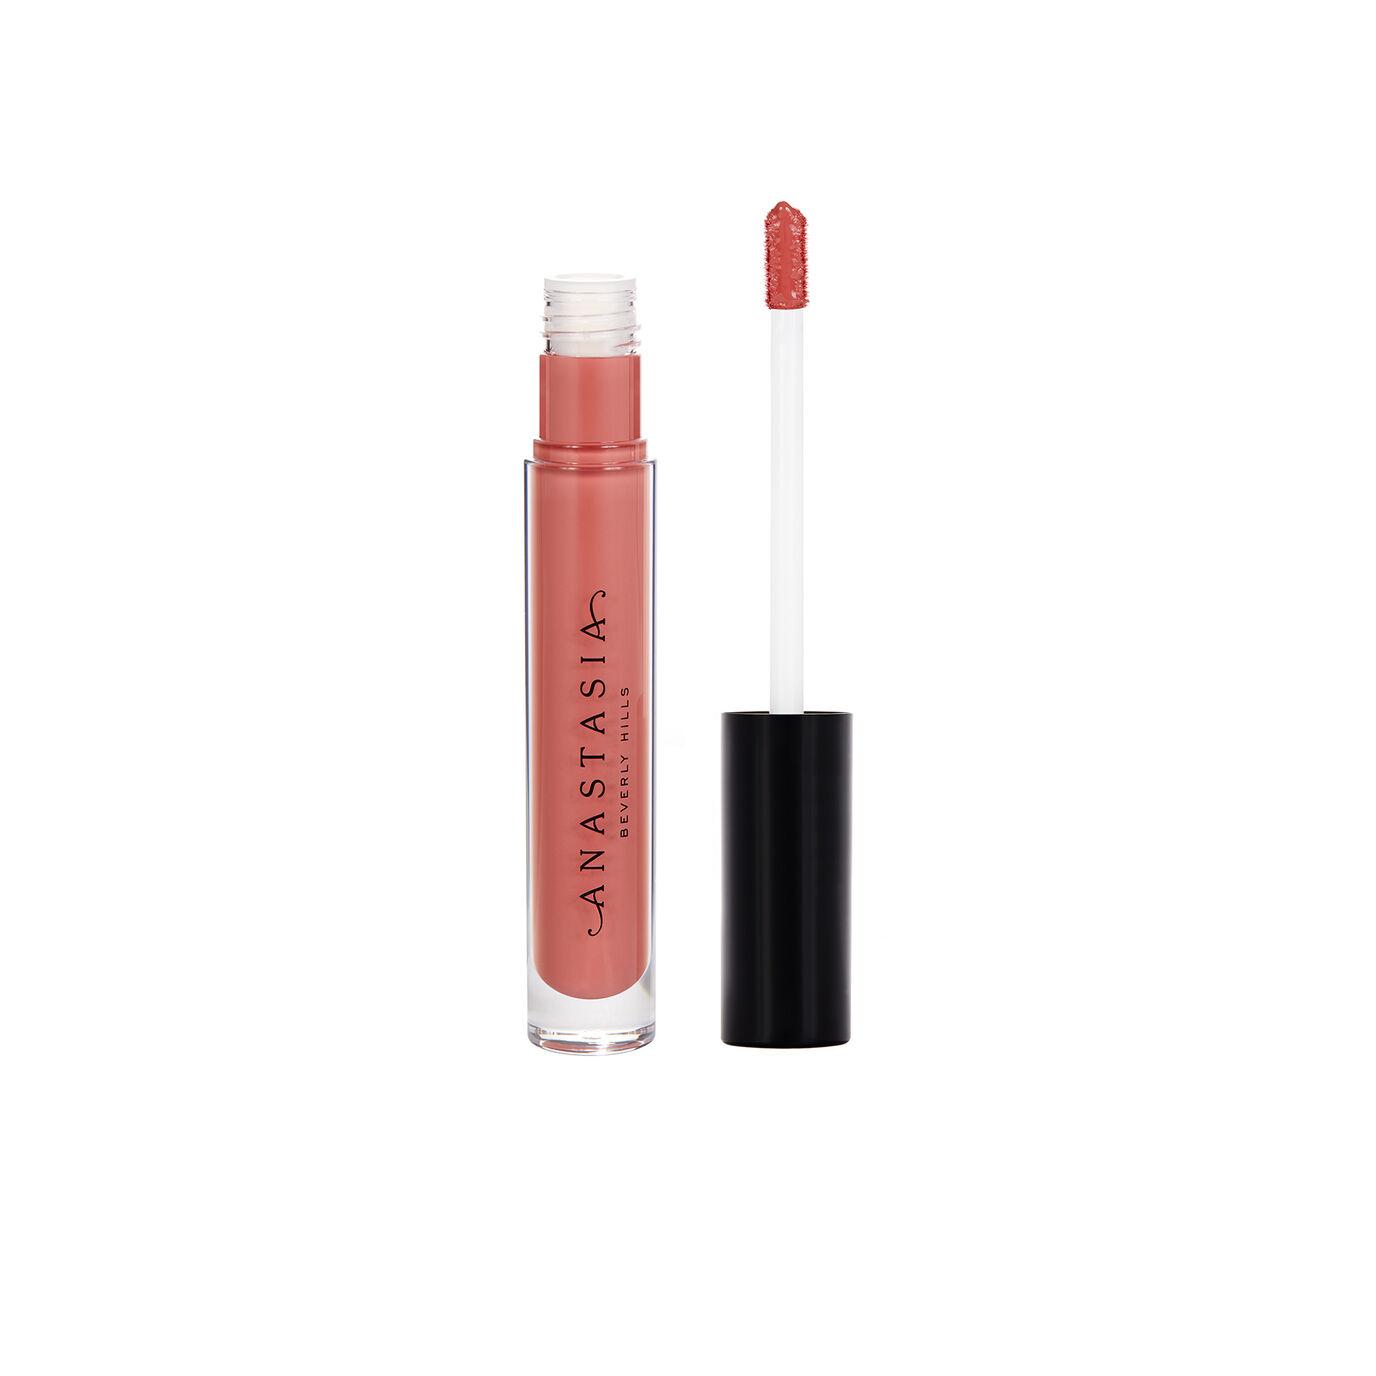 Lip Gloss - Caramel